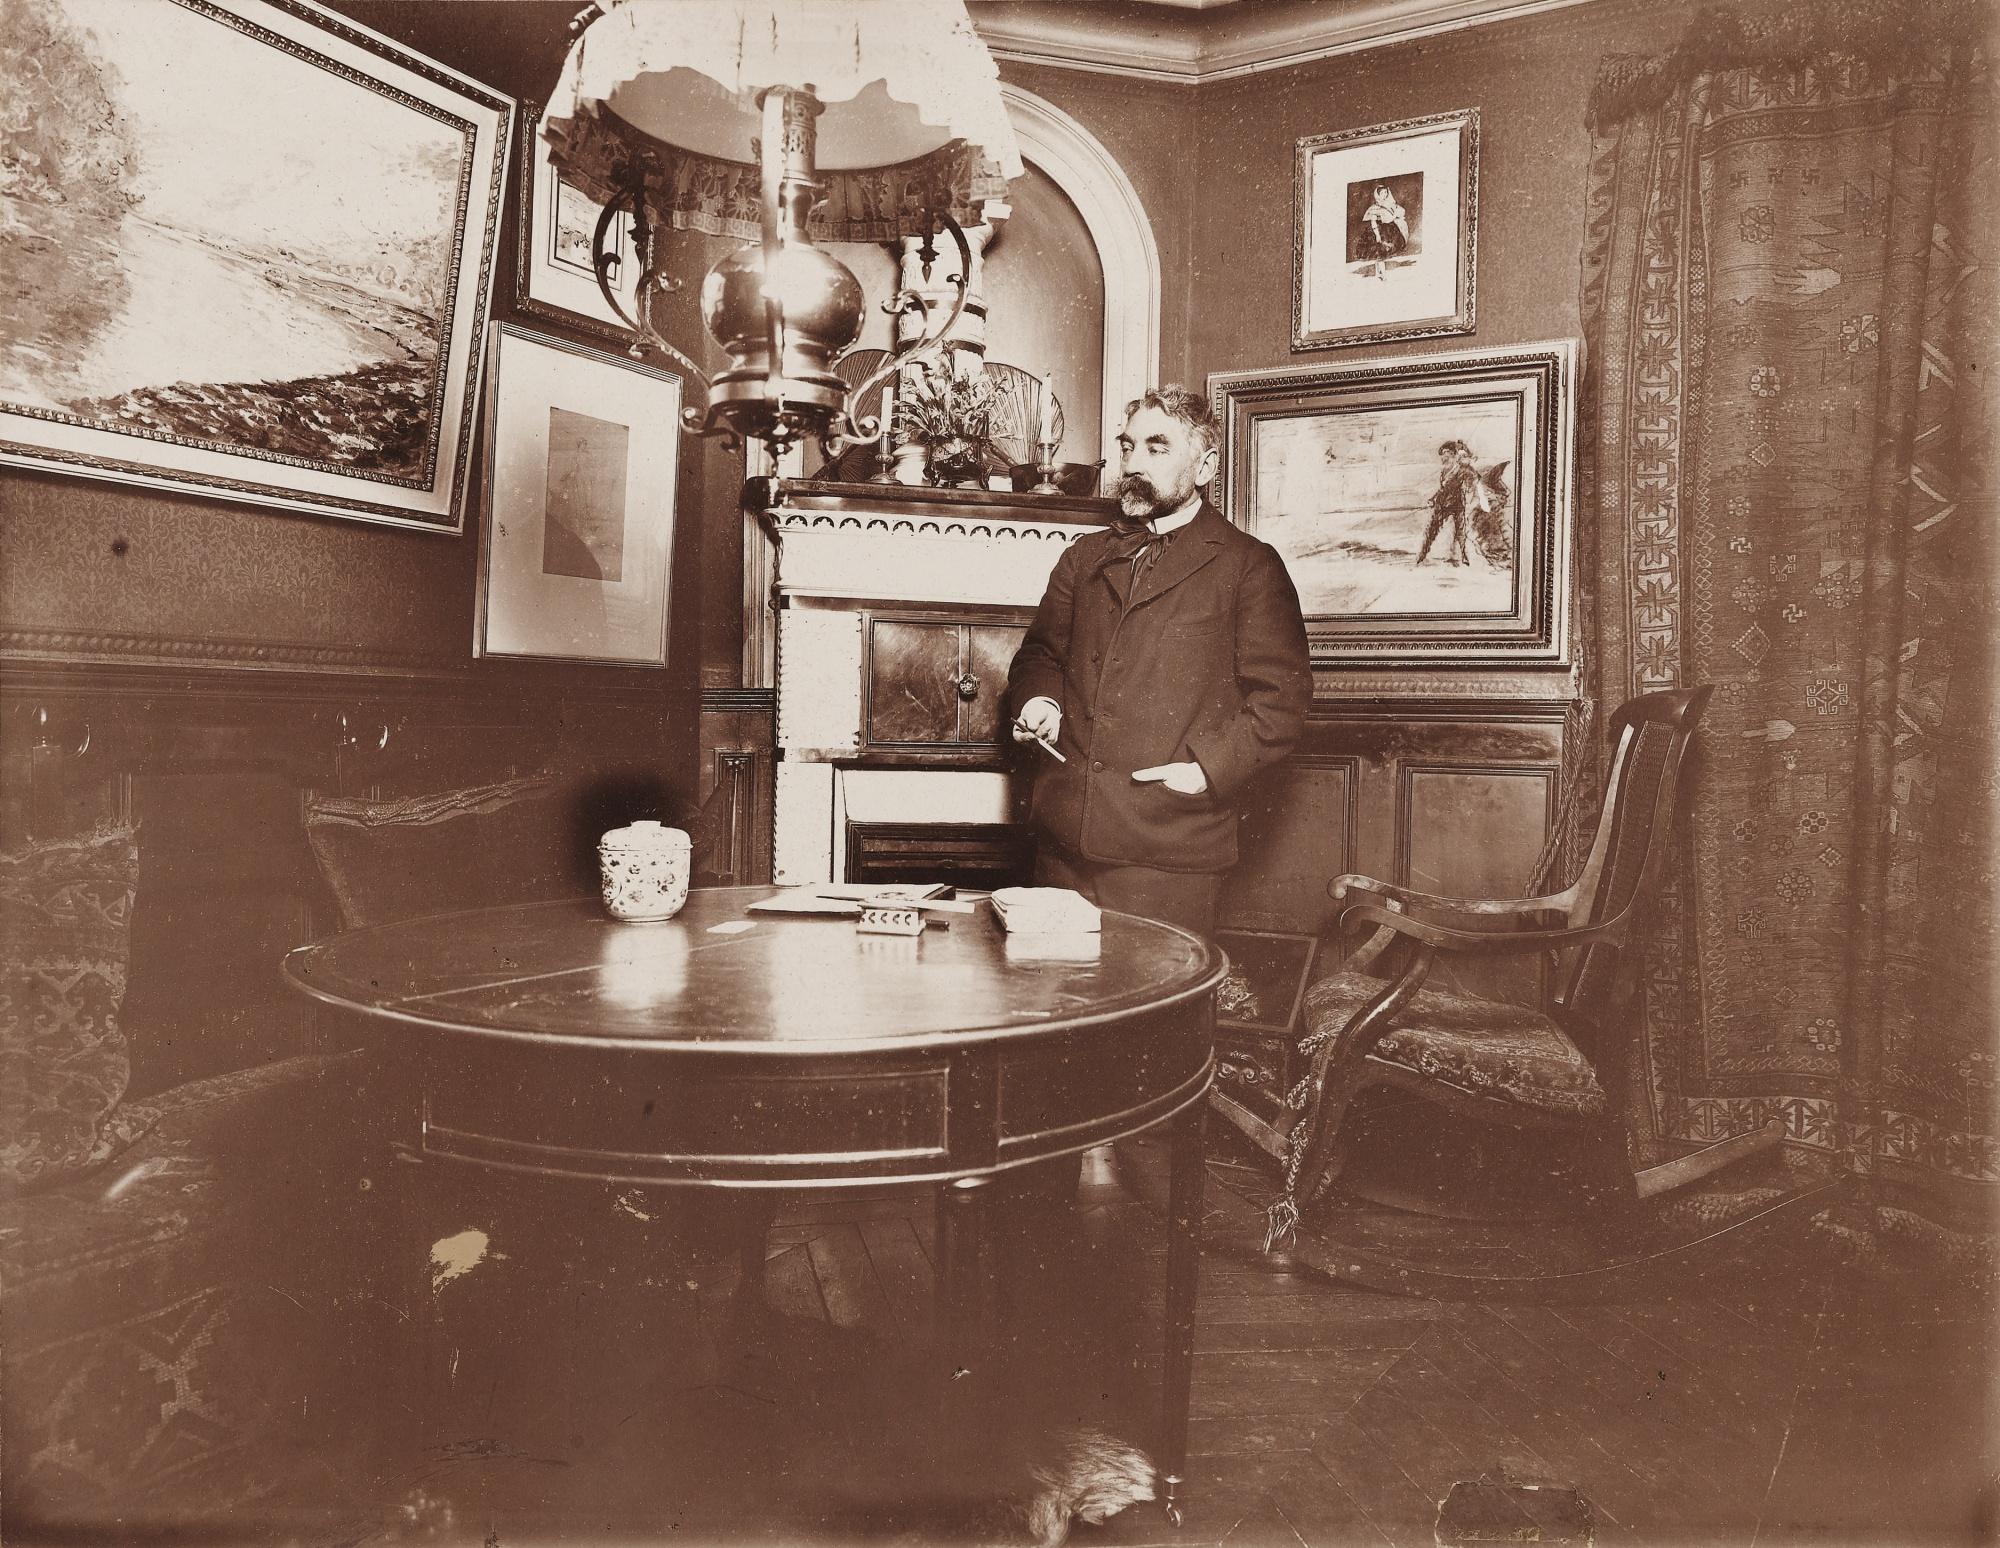 File:Stéphane Mallarmé - 89 Rue de Rome - Anonyme 1894-95.jpg - Wikimedia  Commons